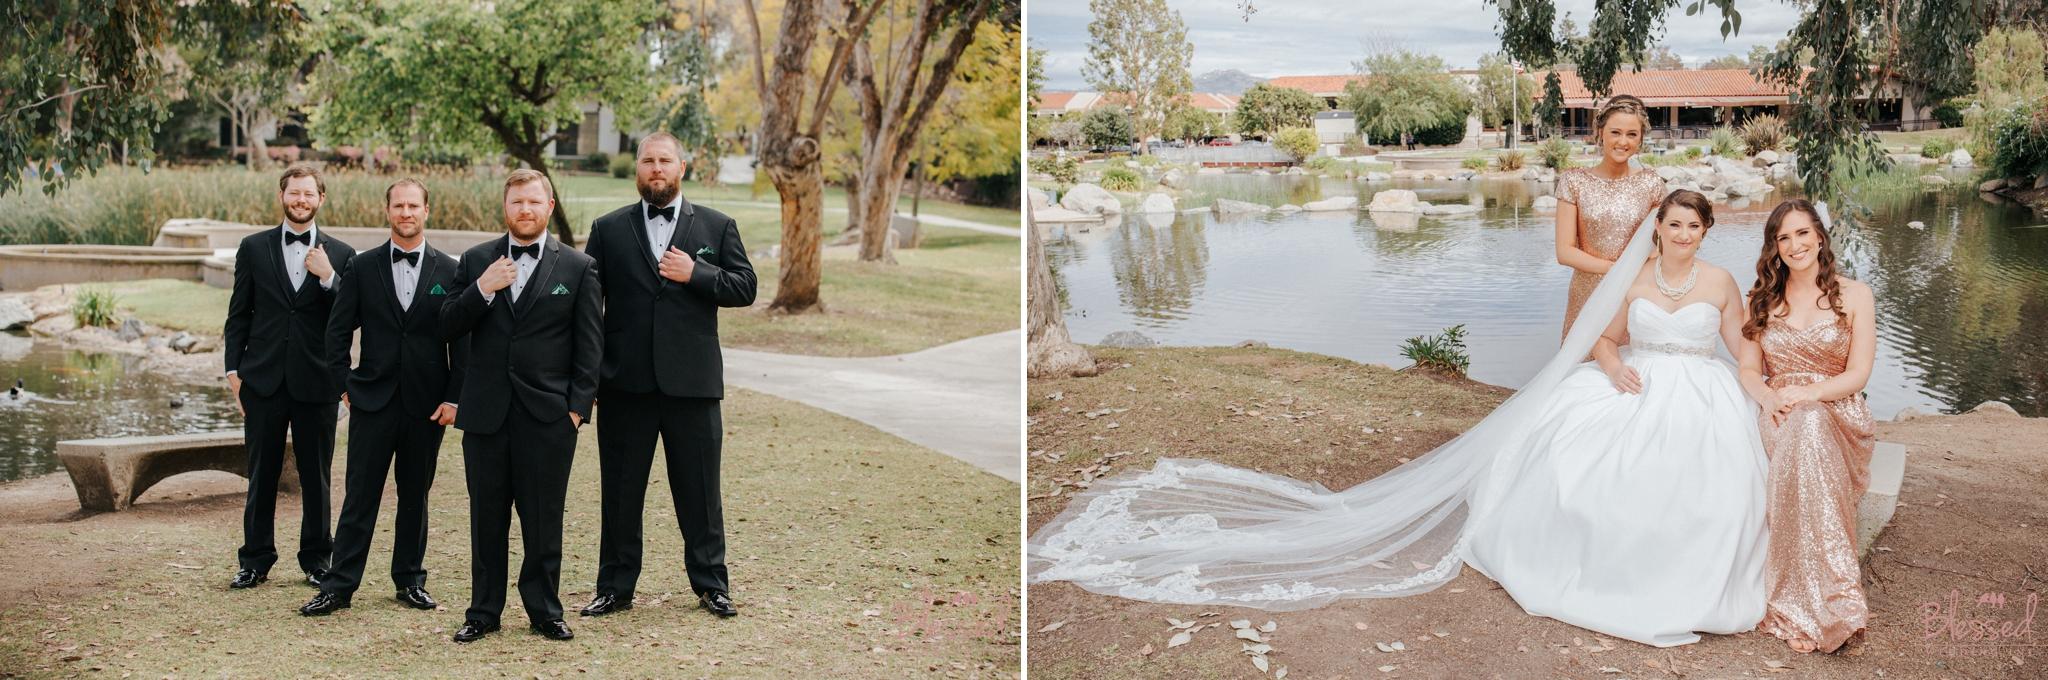 Orfila Vinery Wedding by Blessed Wedding Photography 27.jpg